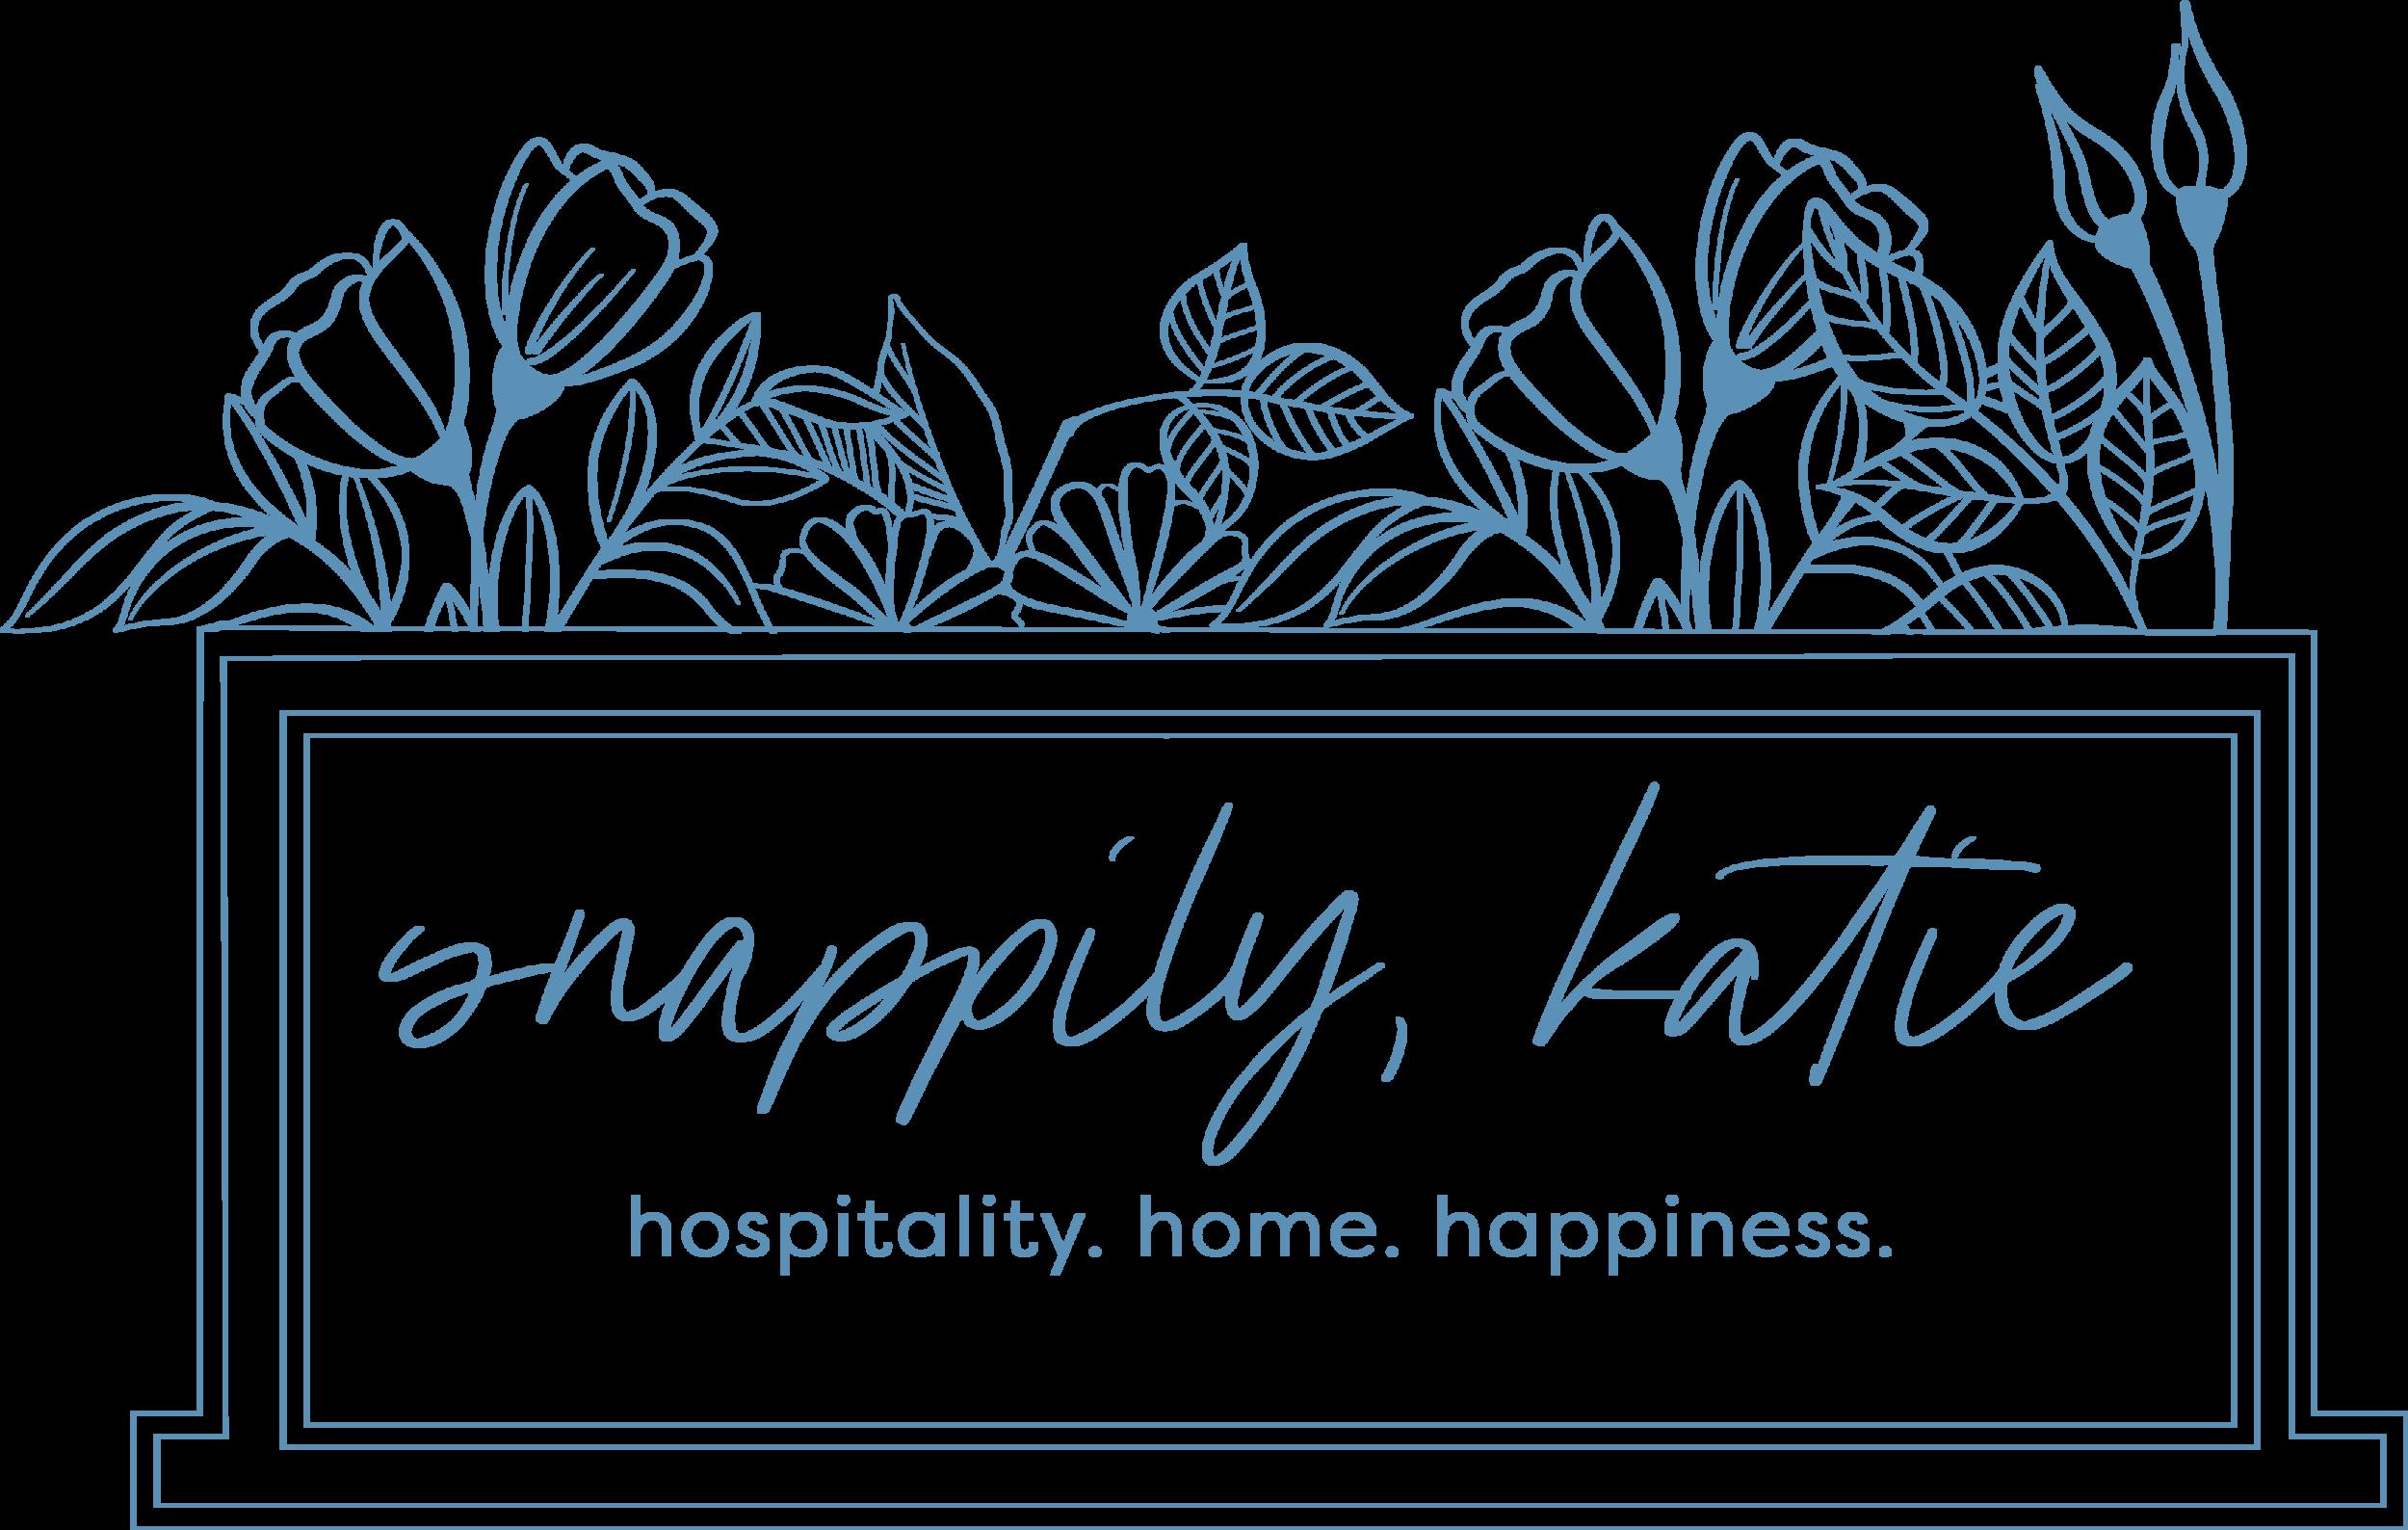 Katie Snapp, Hospitality, Home, Happiness